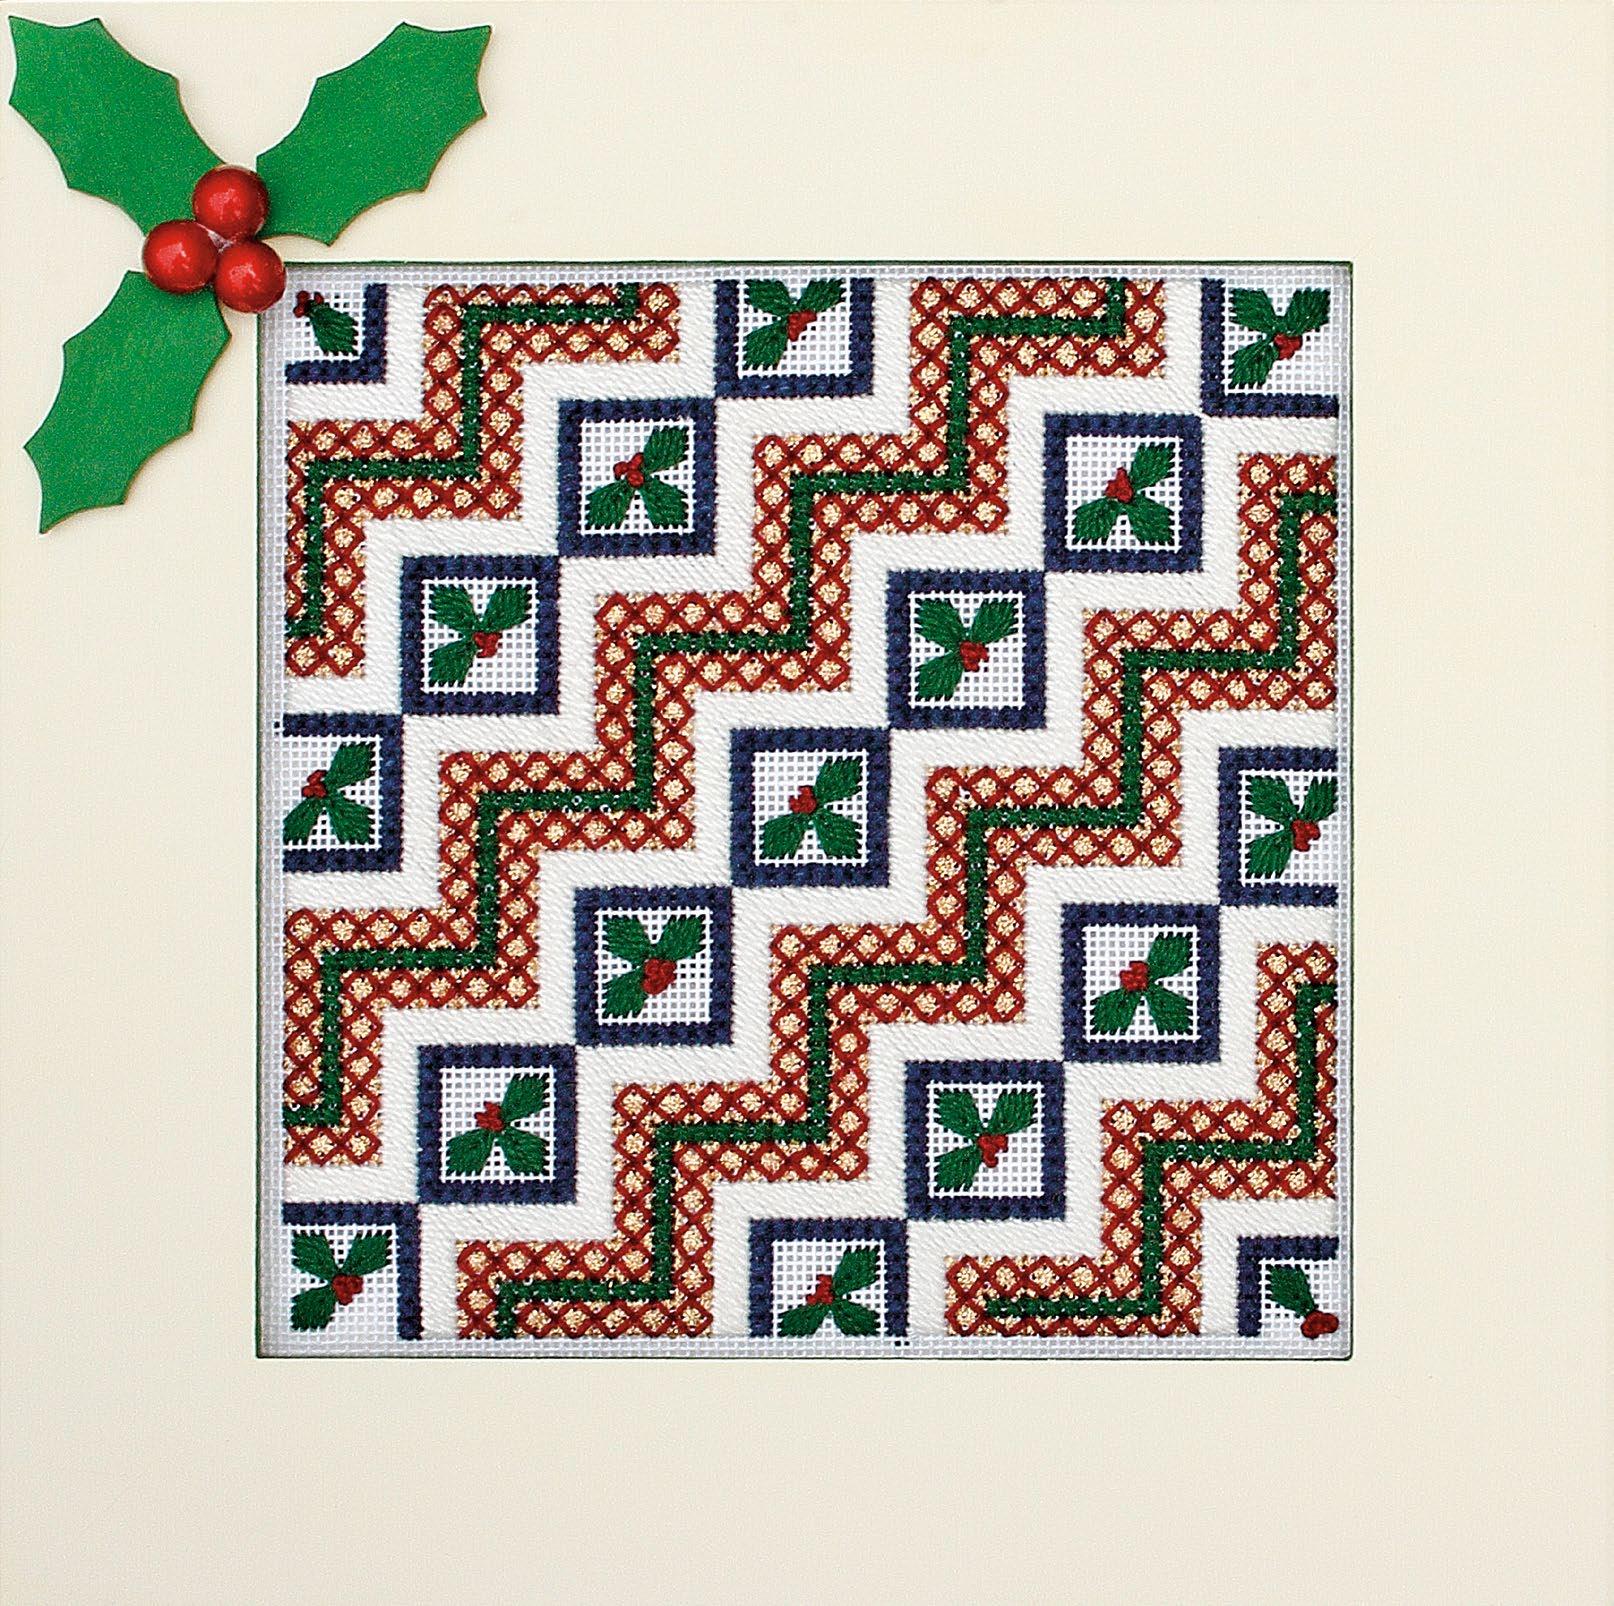 Holly Berry Trivet Pattern - Festive 2011